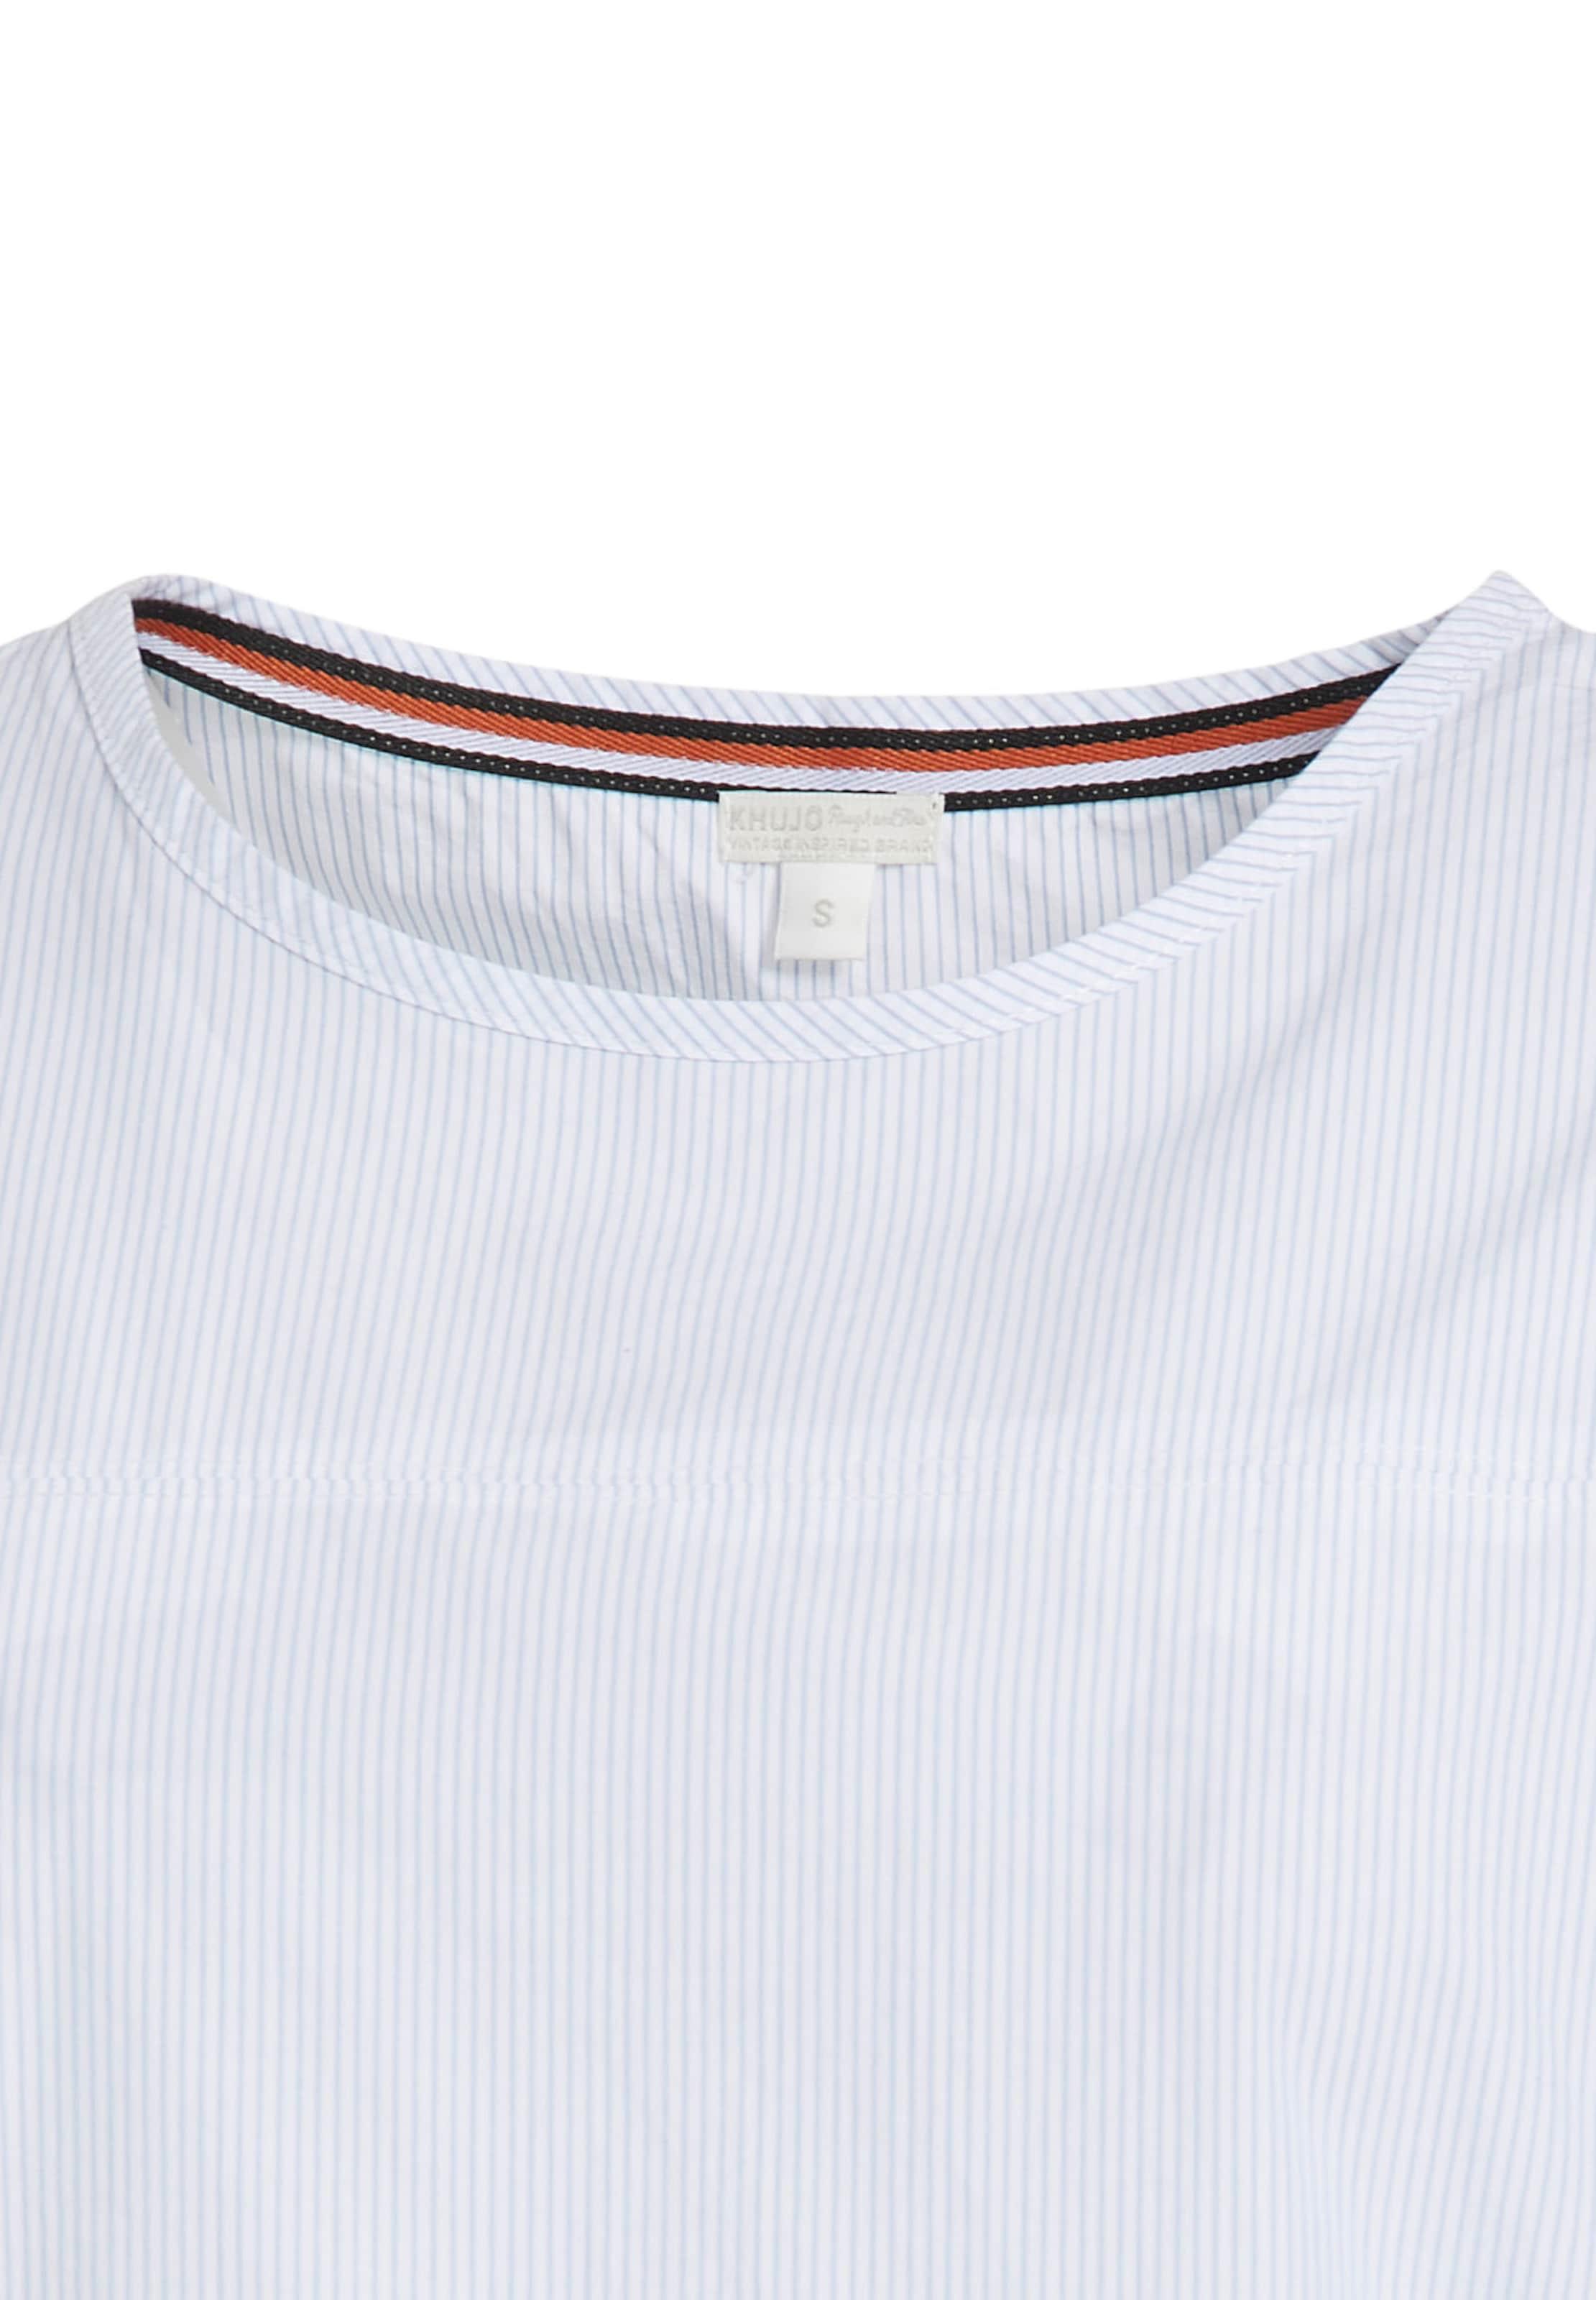 Shirt 'betria' HellblauWeiß HellblauWeiß Khujo Khujo In 'betria' In Shirt Khujo jA43R5L